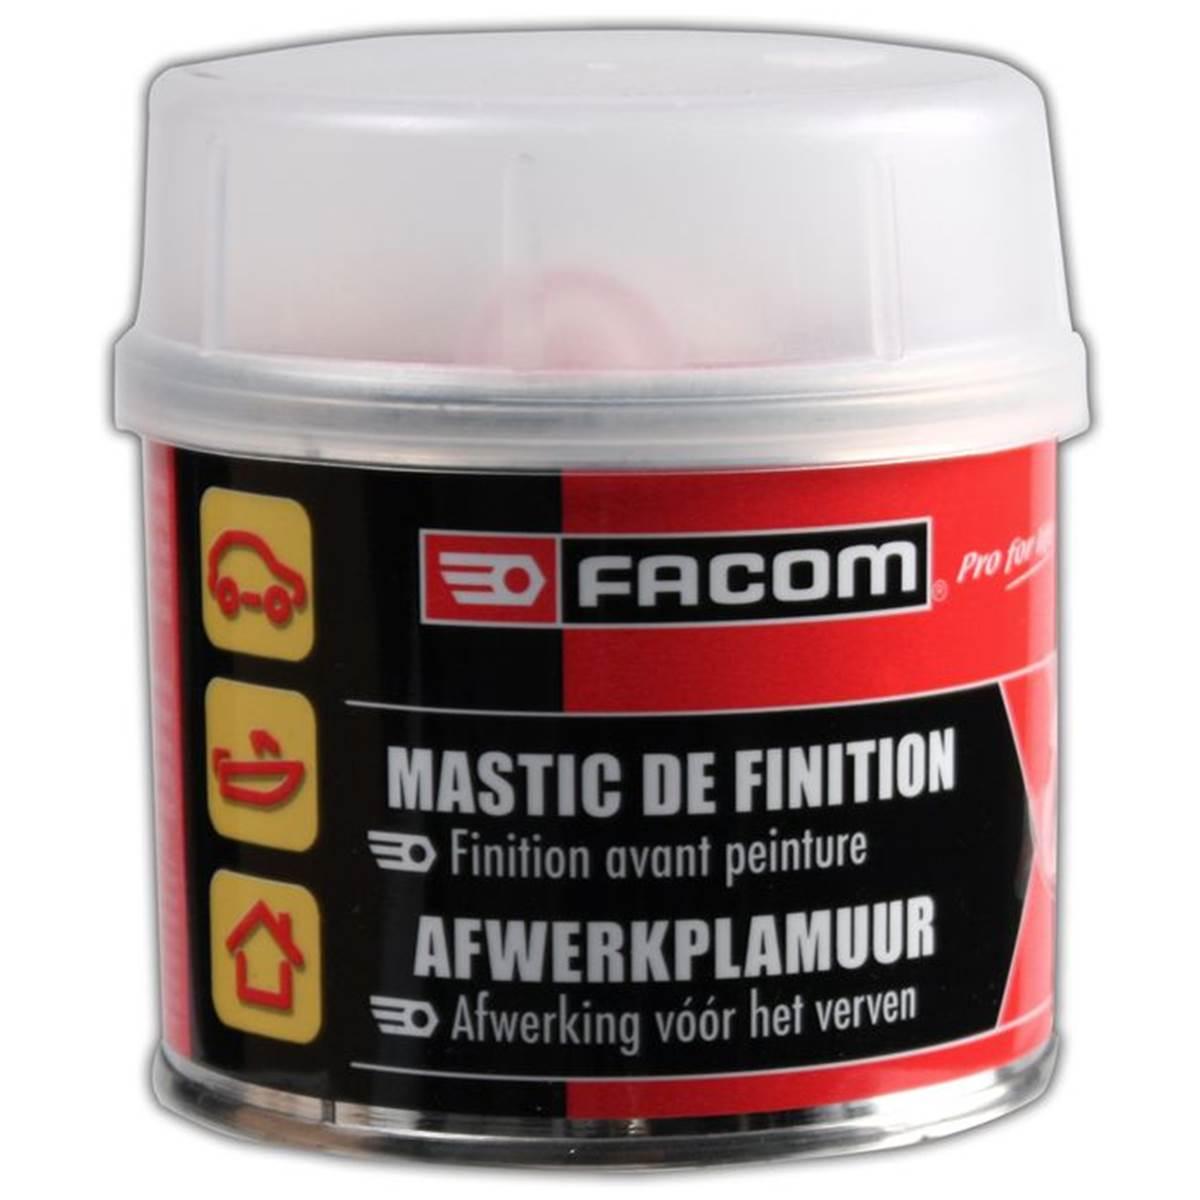 Mastic polyester de finition Facom 250 g